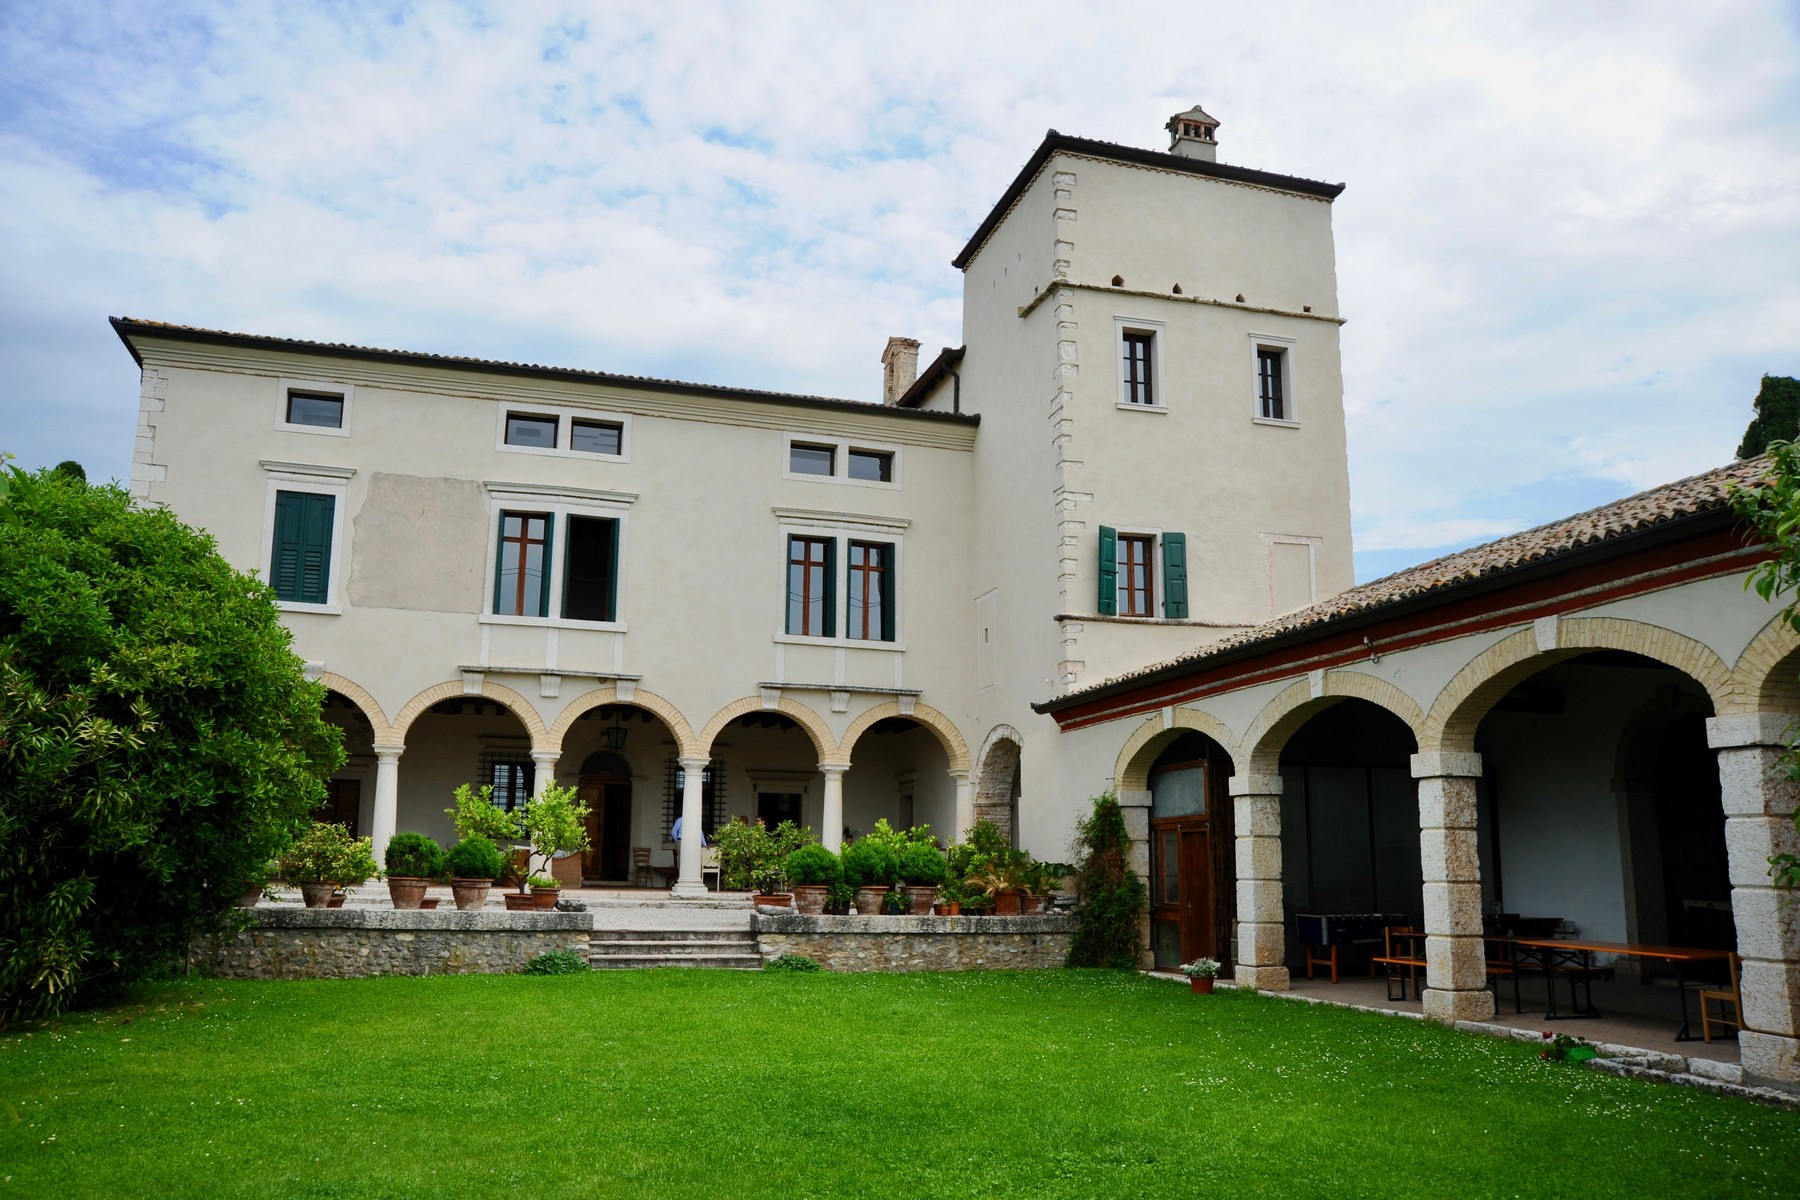 Villa in Vendita a Verona: 5 locali, 450 mq - Foto 25